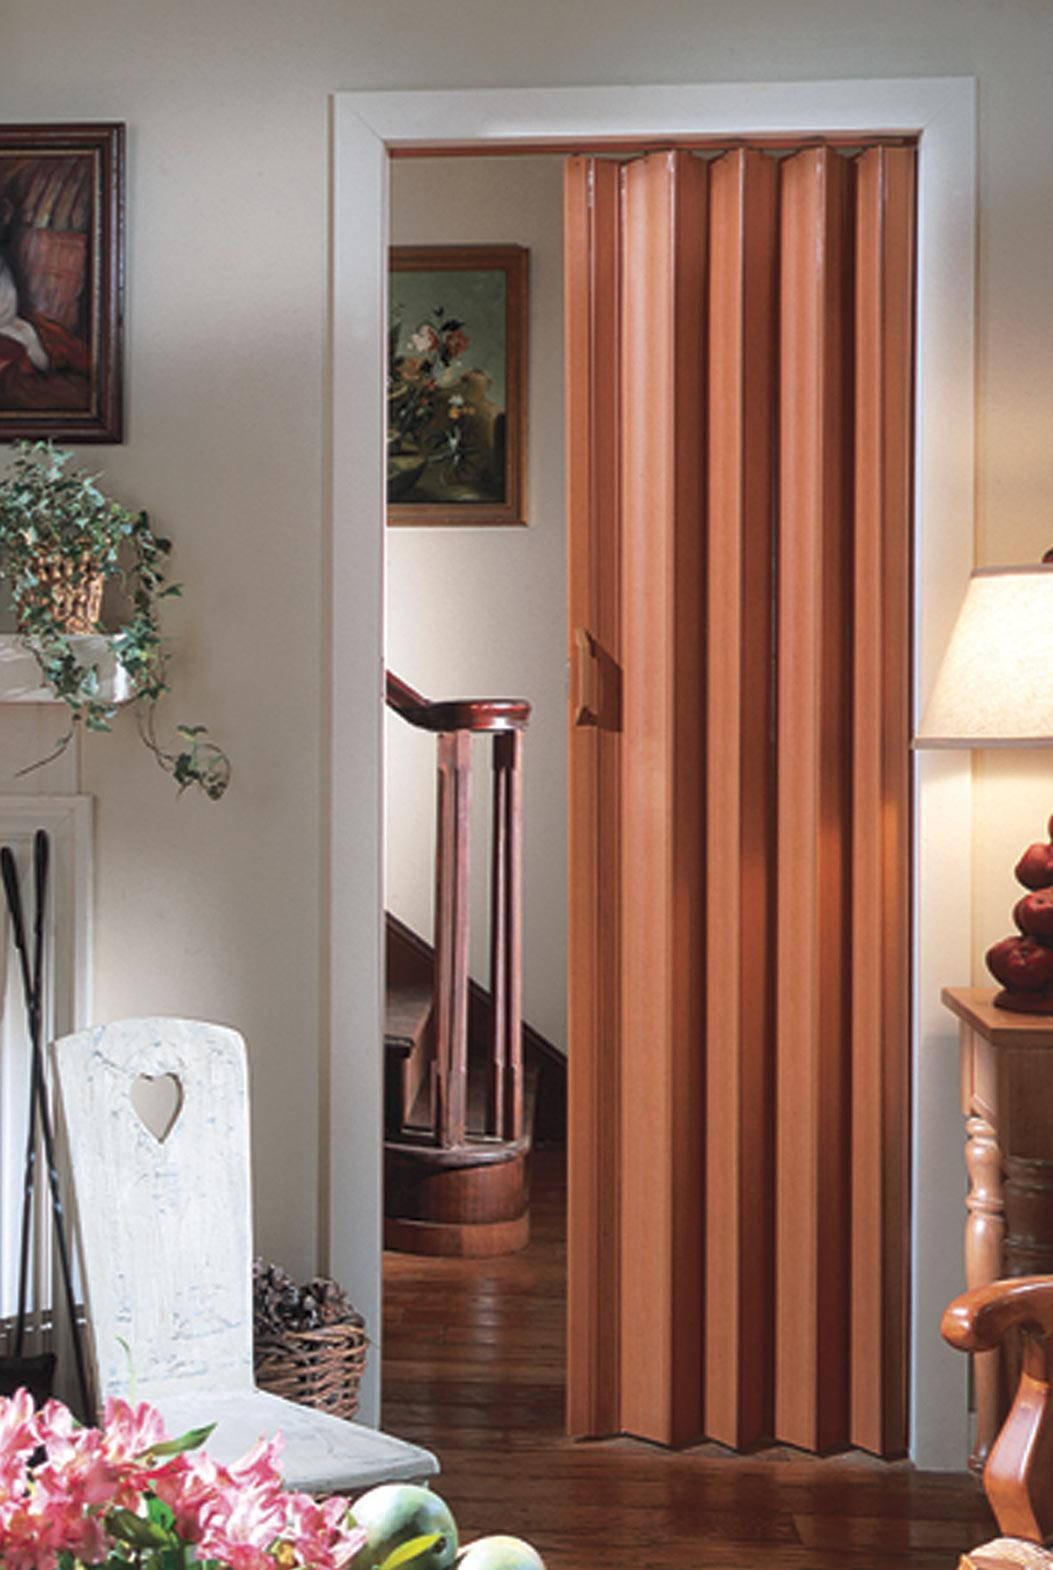 porte pliante accordeon castorama roulettes porte. Black Bedroom Furniture Sets. Home Design Ideas